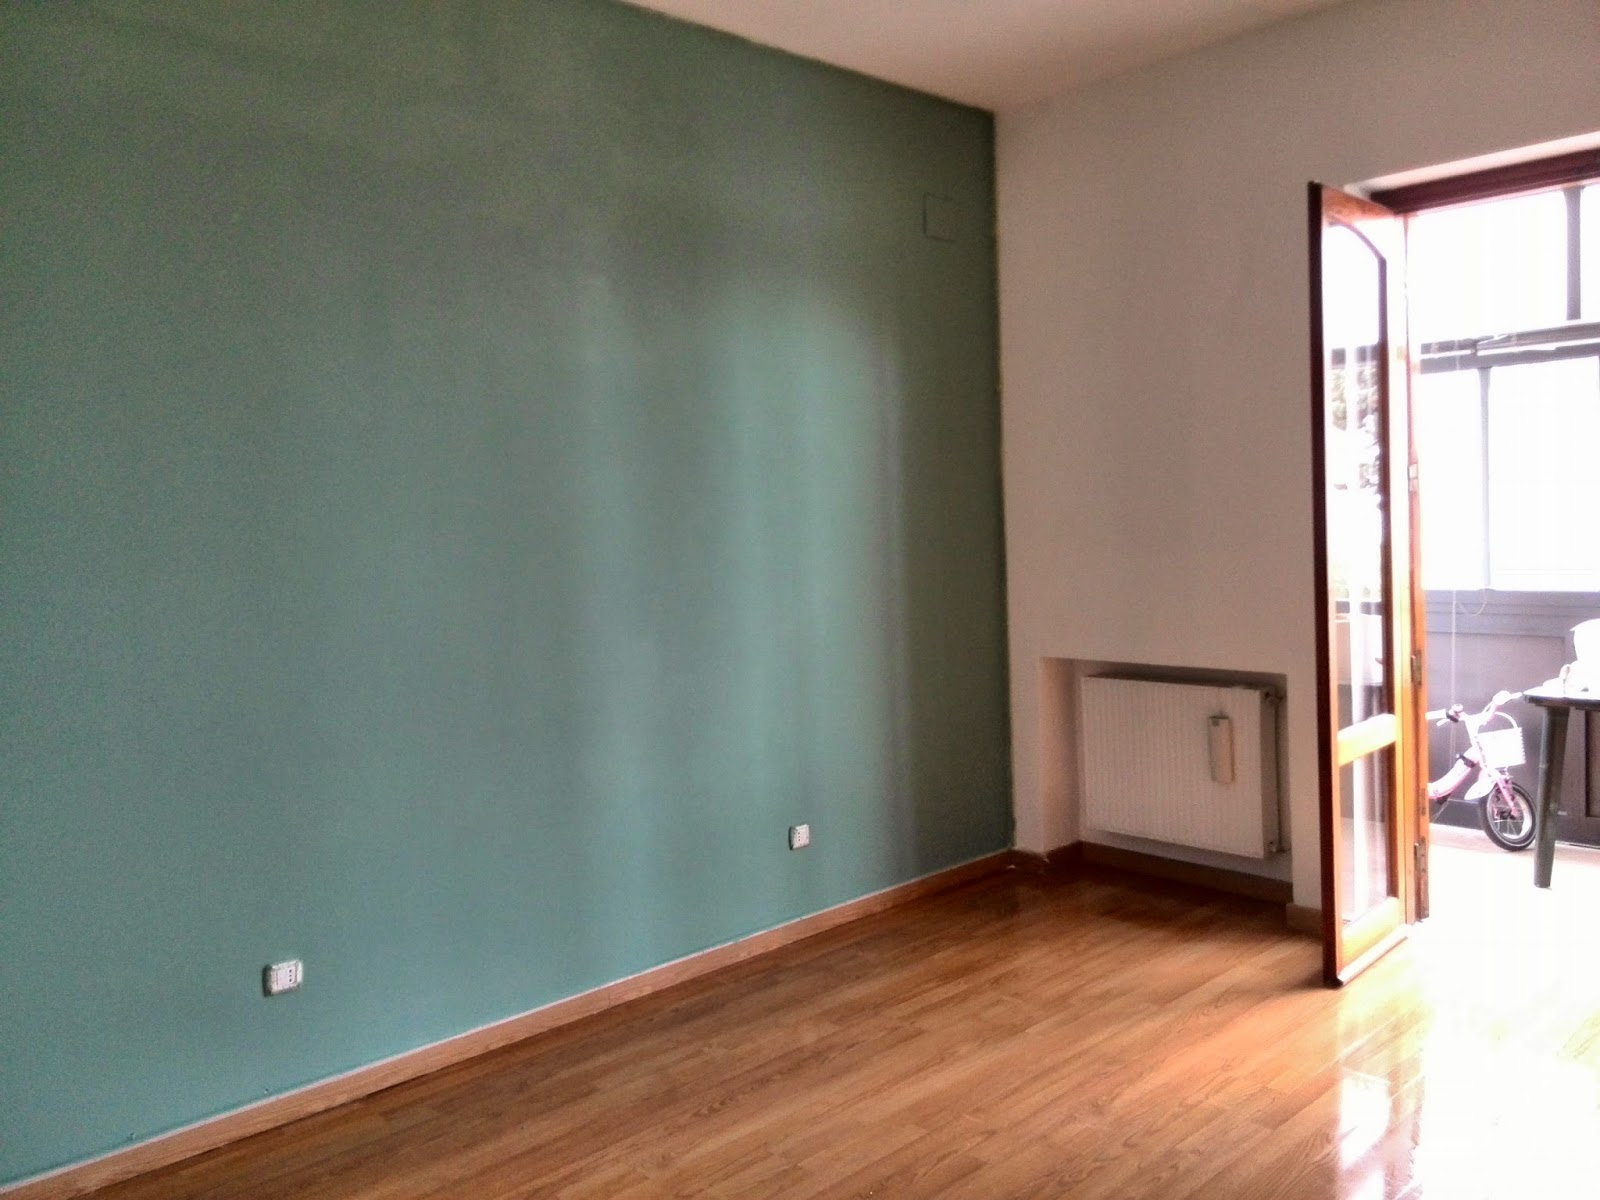 Casa nuova #work in progress